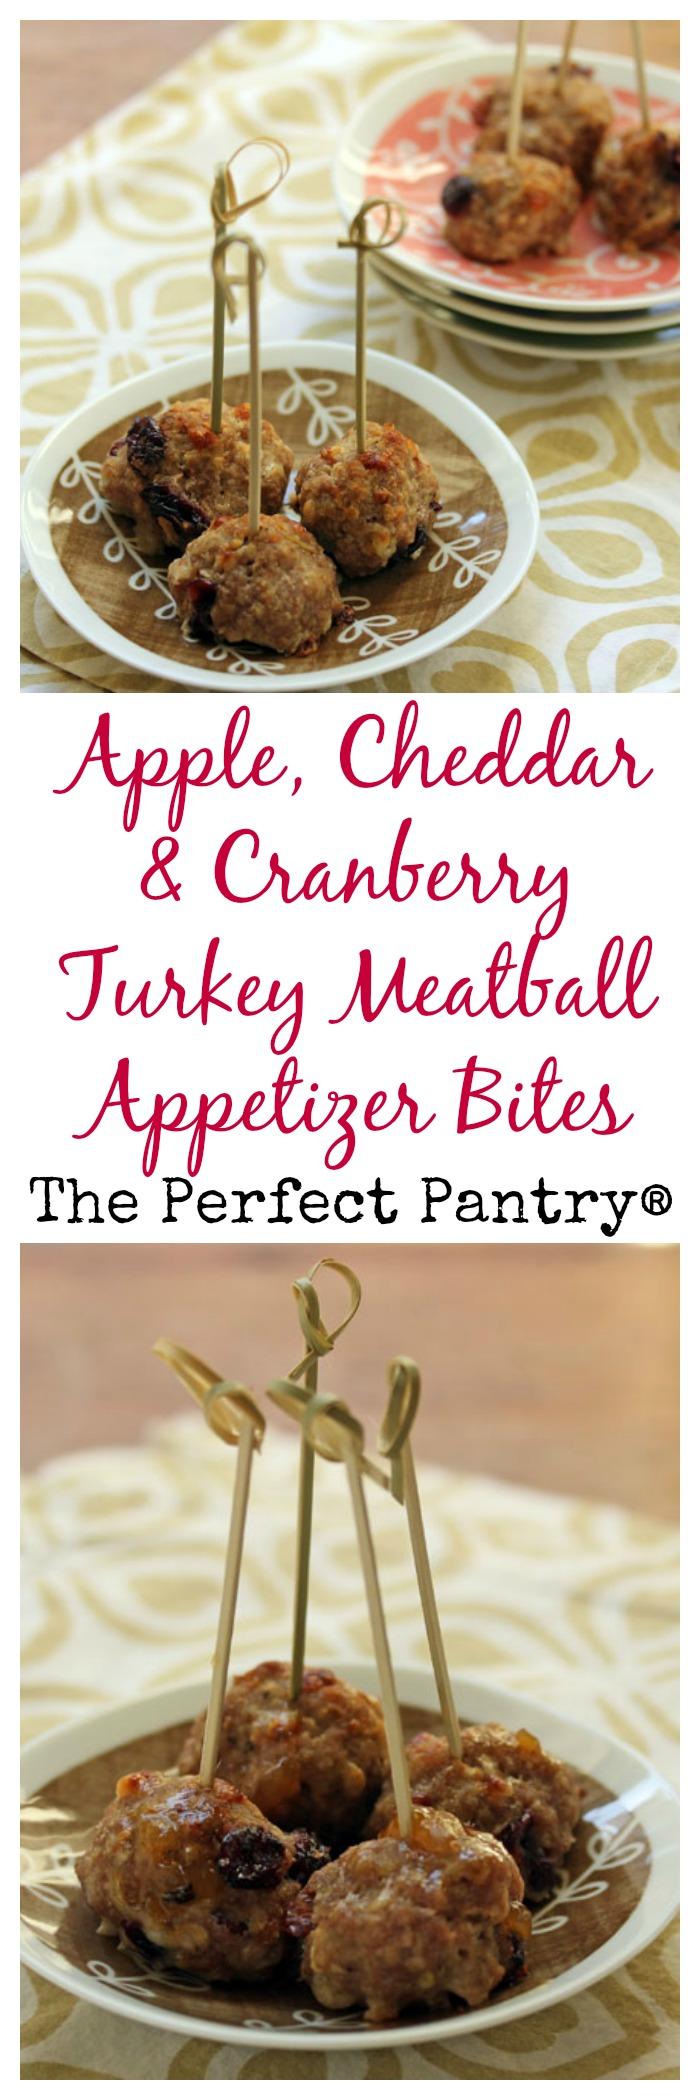 Little turkey meatballs that taste just like apple pie! [ThePerfectPantry.com]